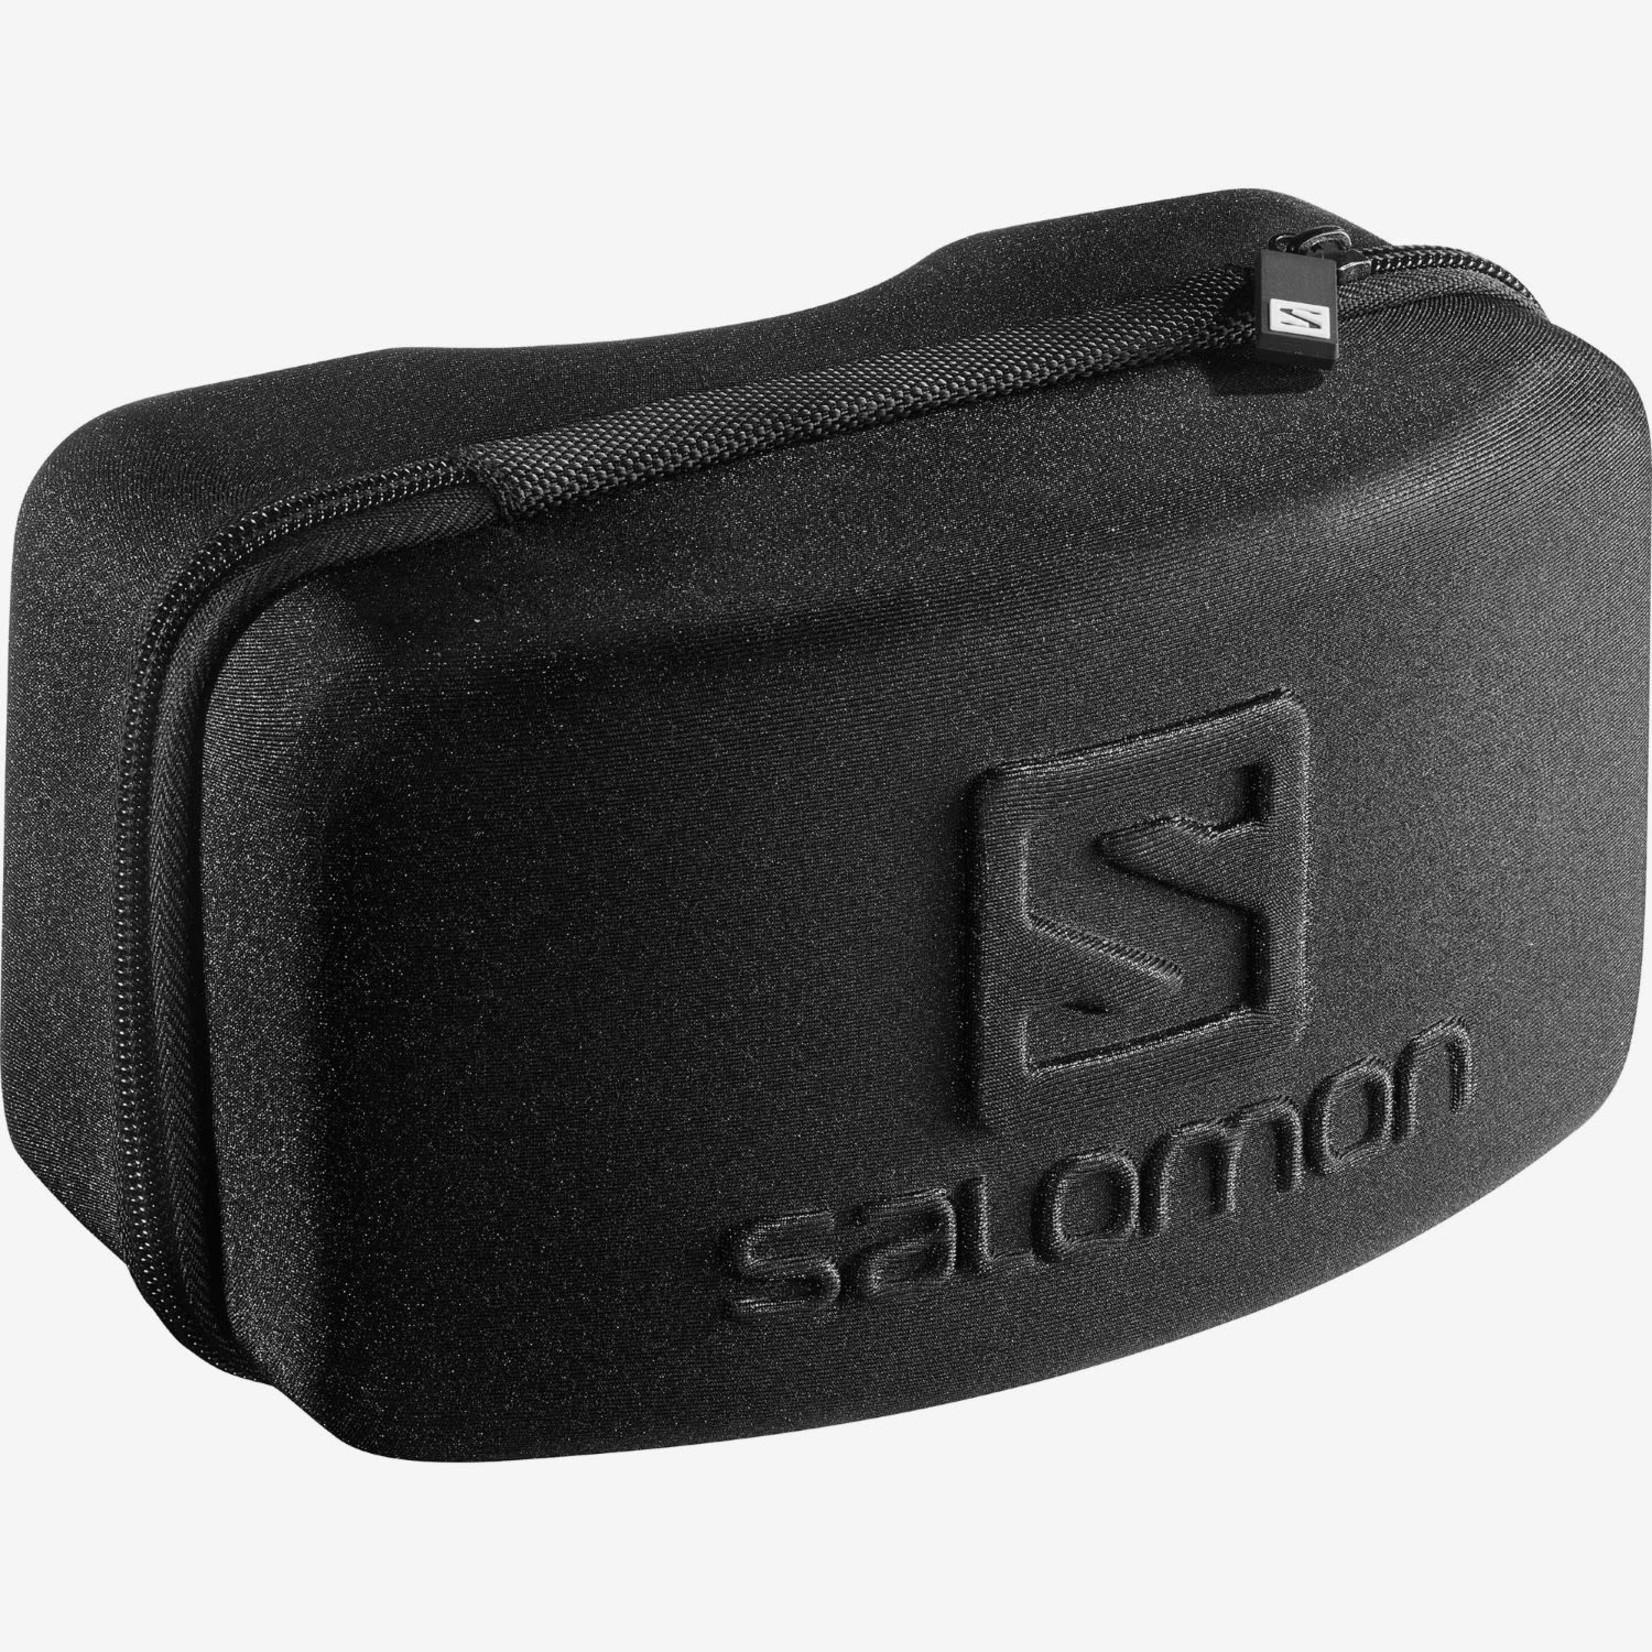 Salomon Salomon Ivy Sigma Photochromatic Goggle - Women